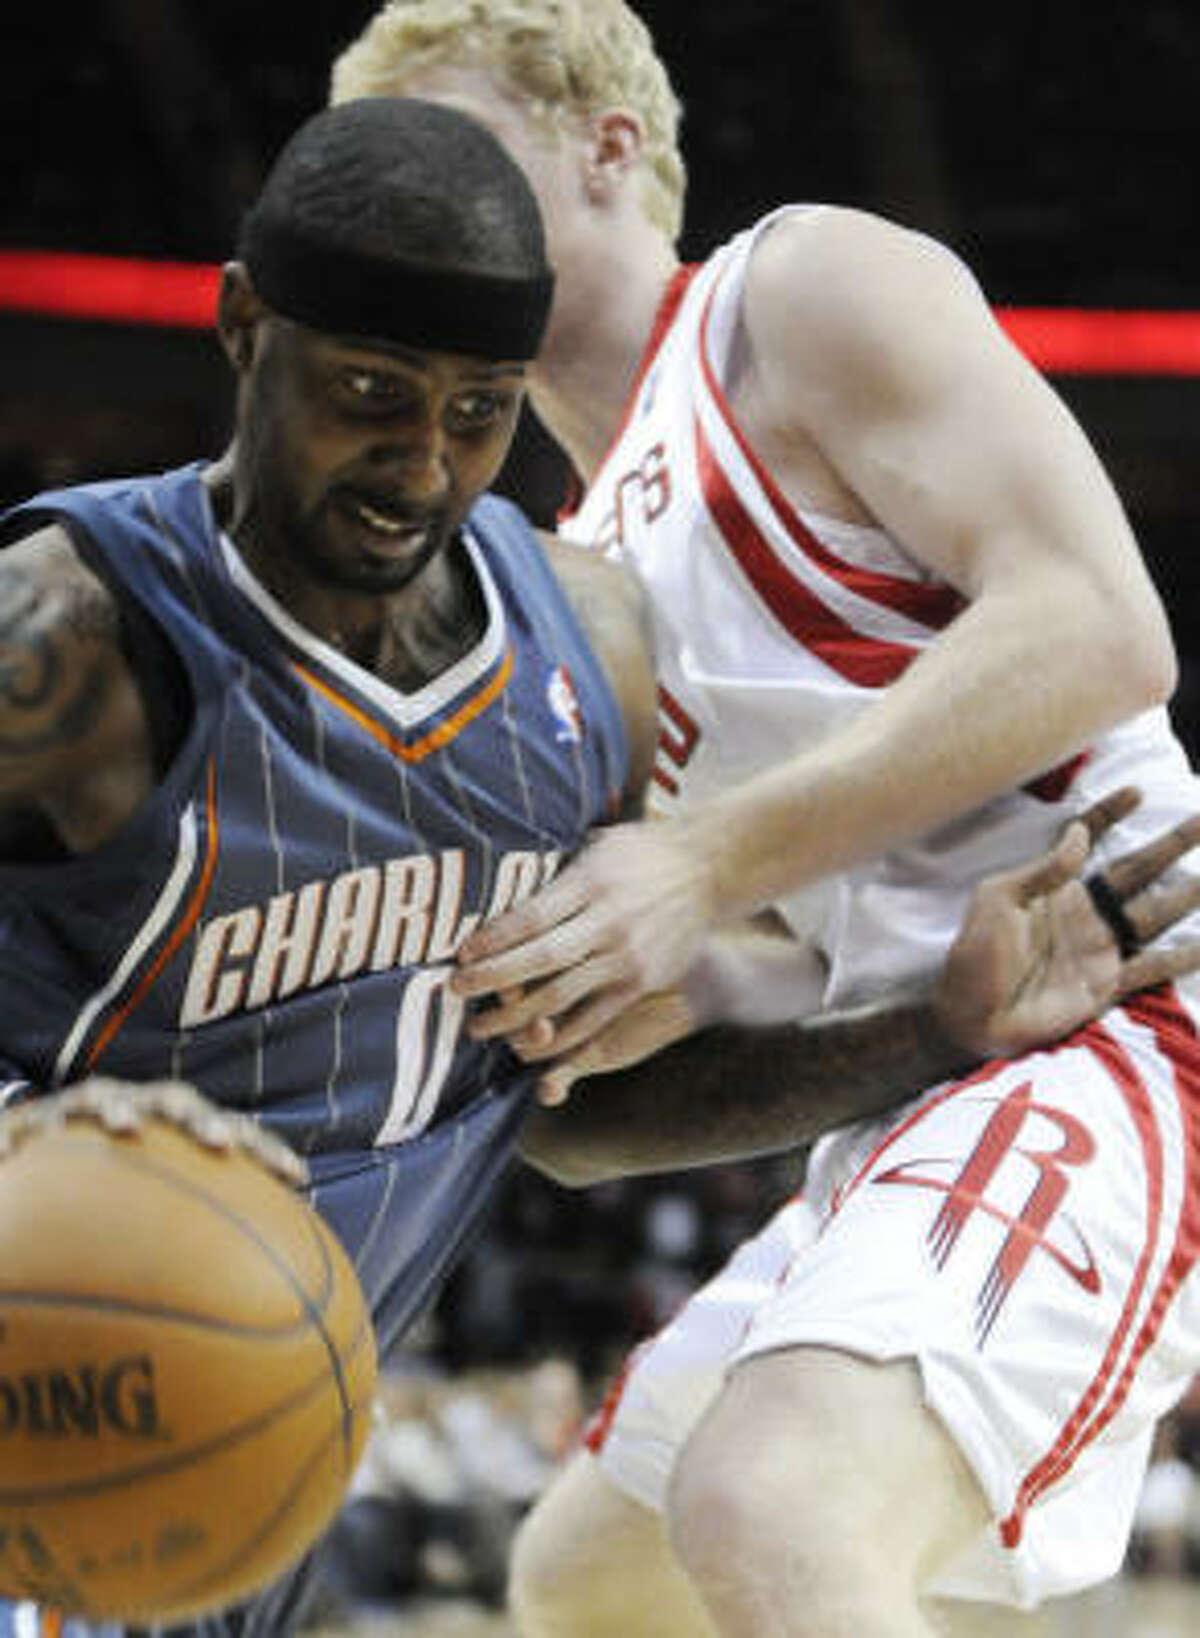 Bobcats guard Larry Hughes (0) pushes past Rockets forward Chase Budinger.